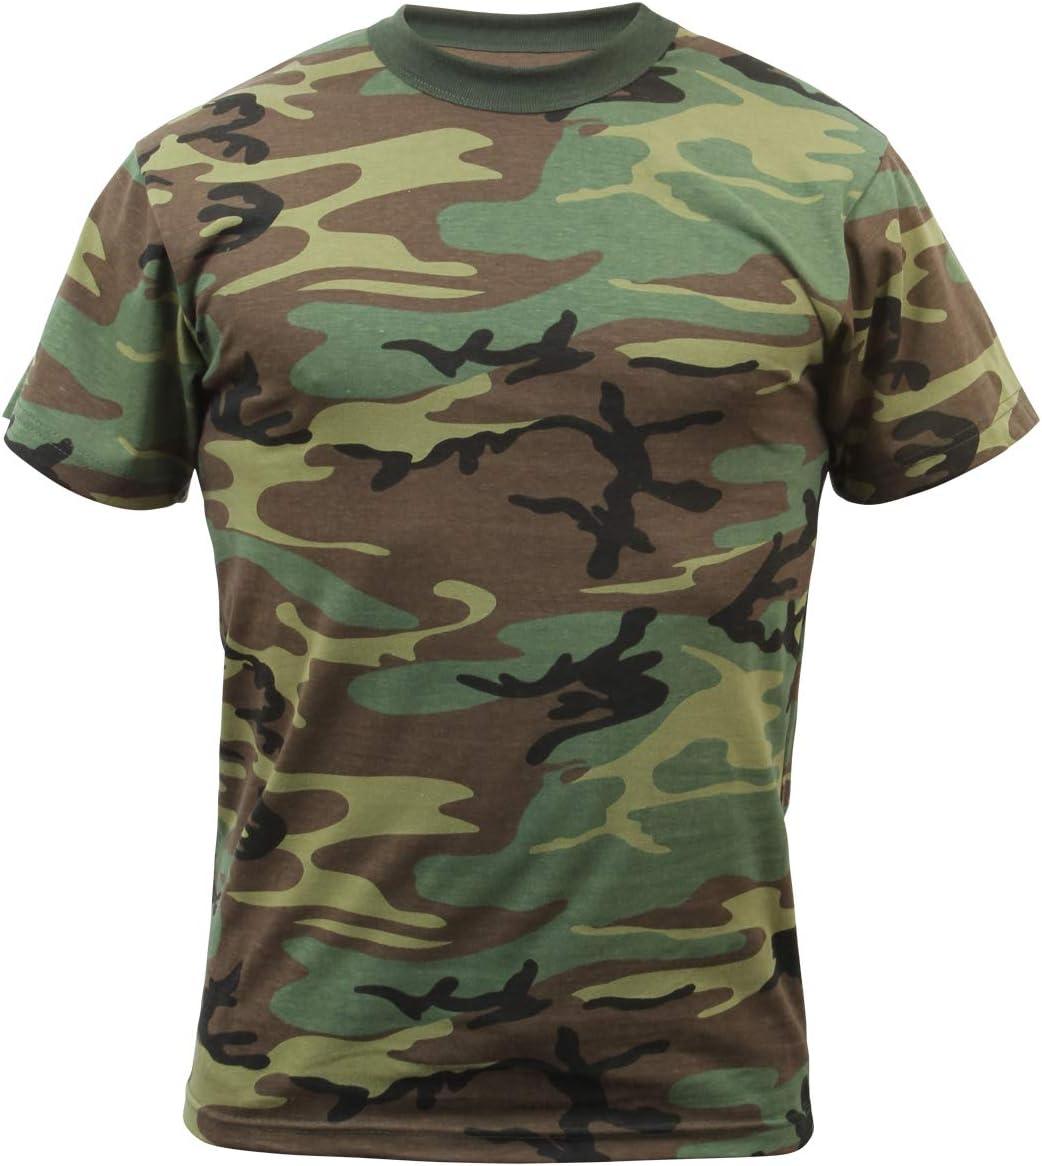 Rothco Camo T-Shirts: Clothing